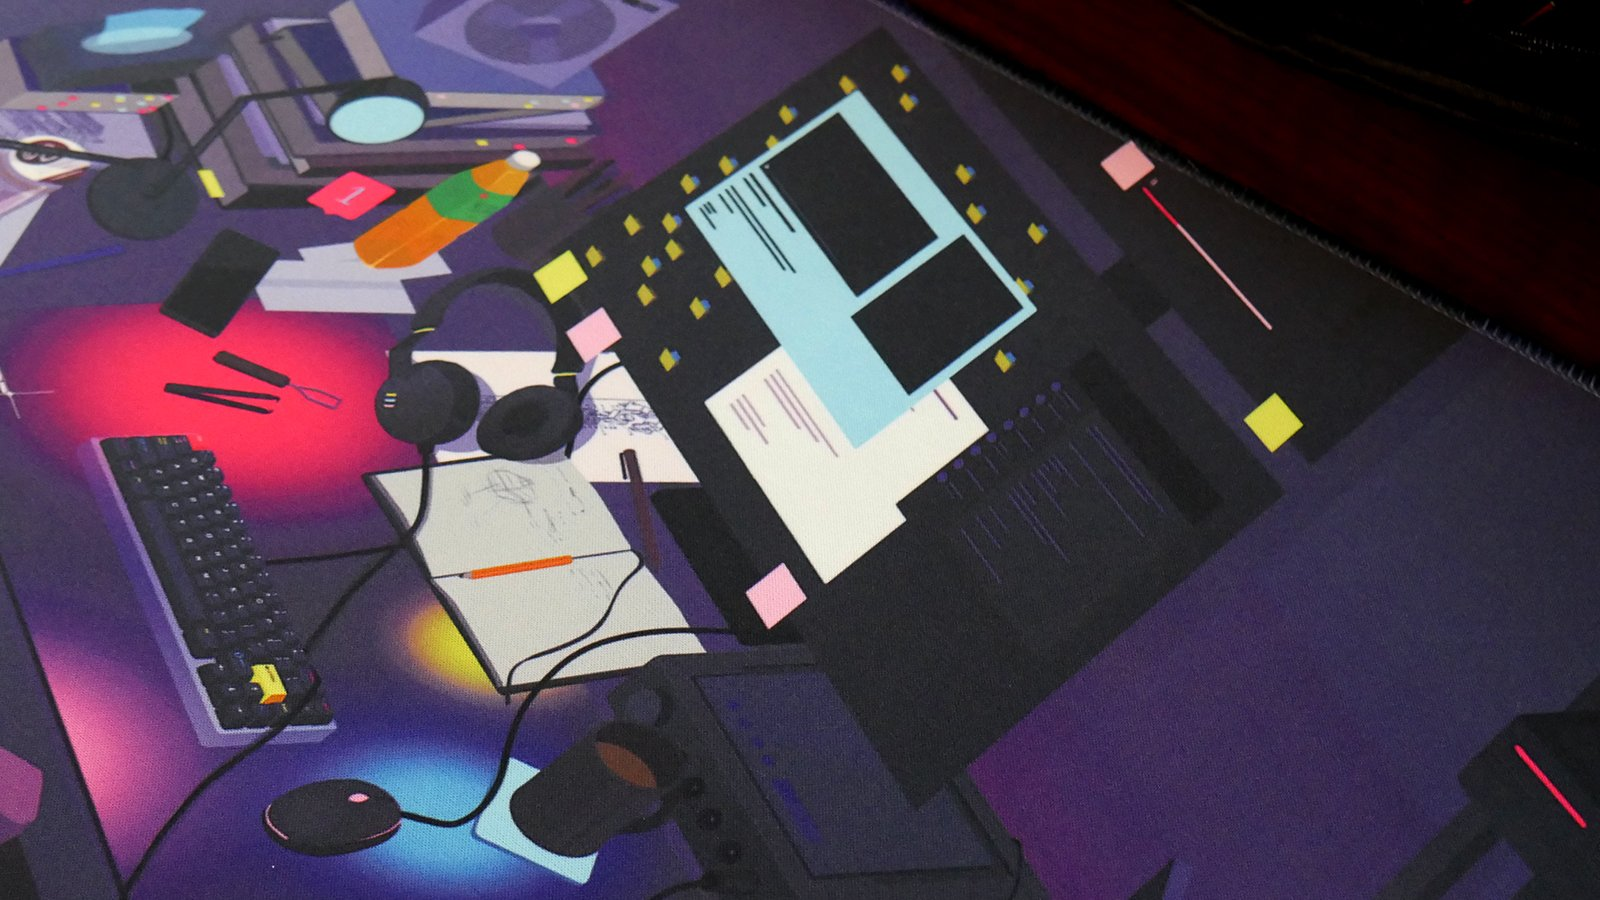 Closeup photo of the deskmat artwork.